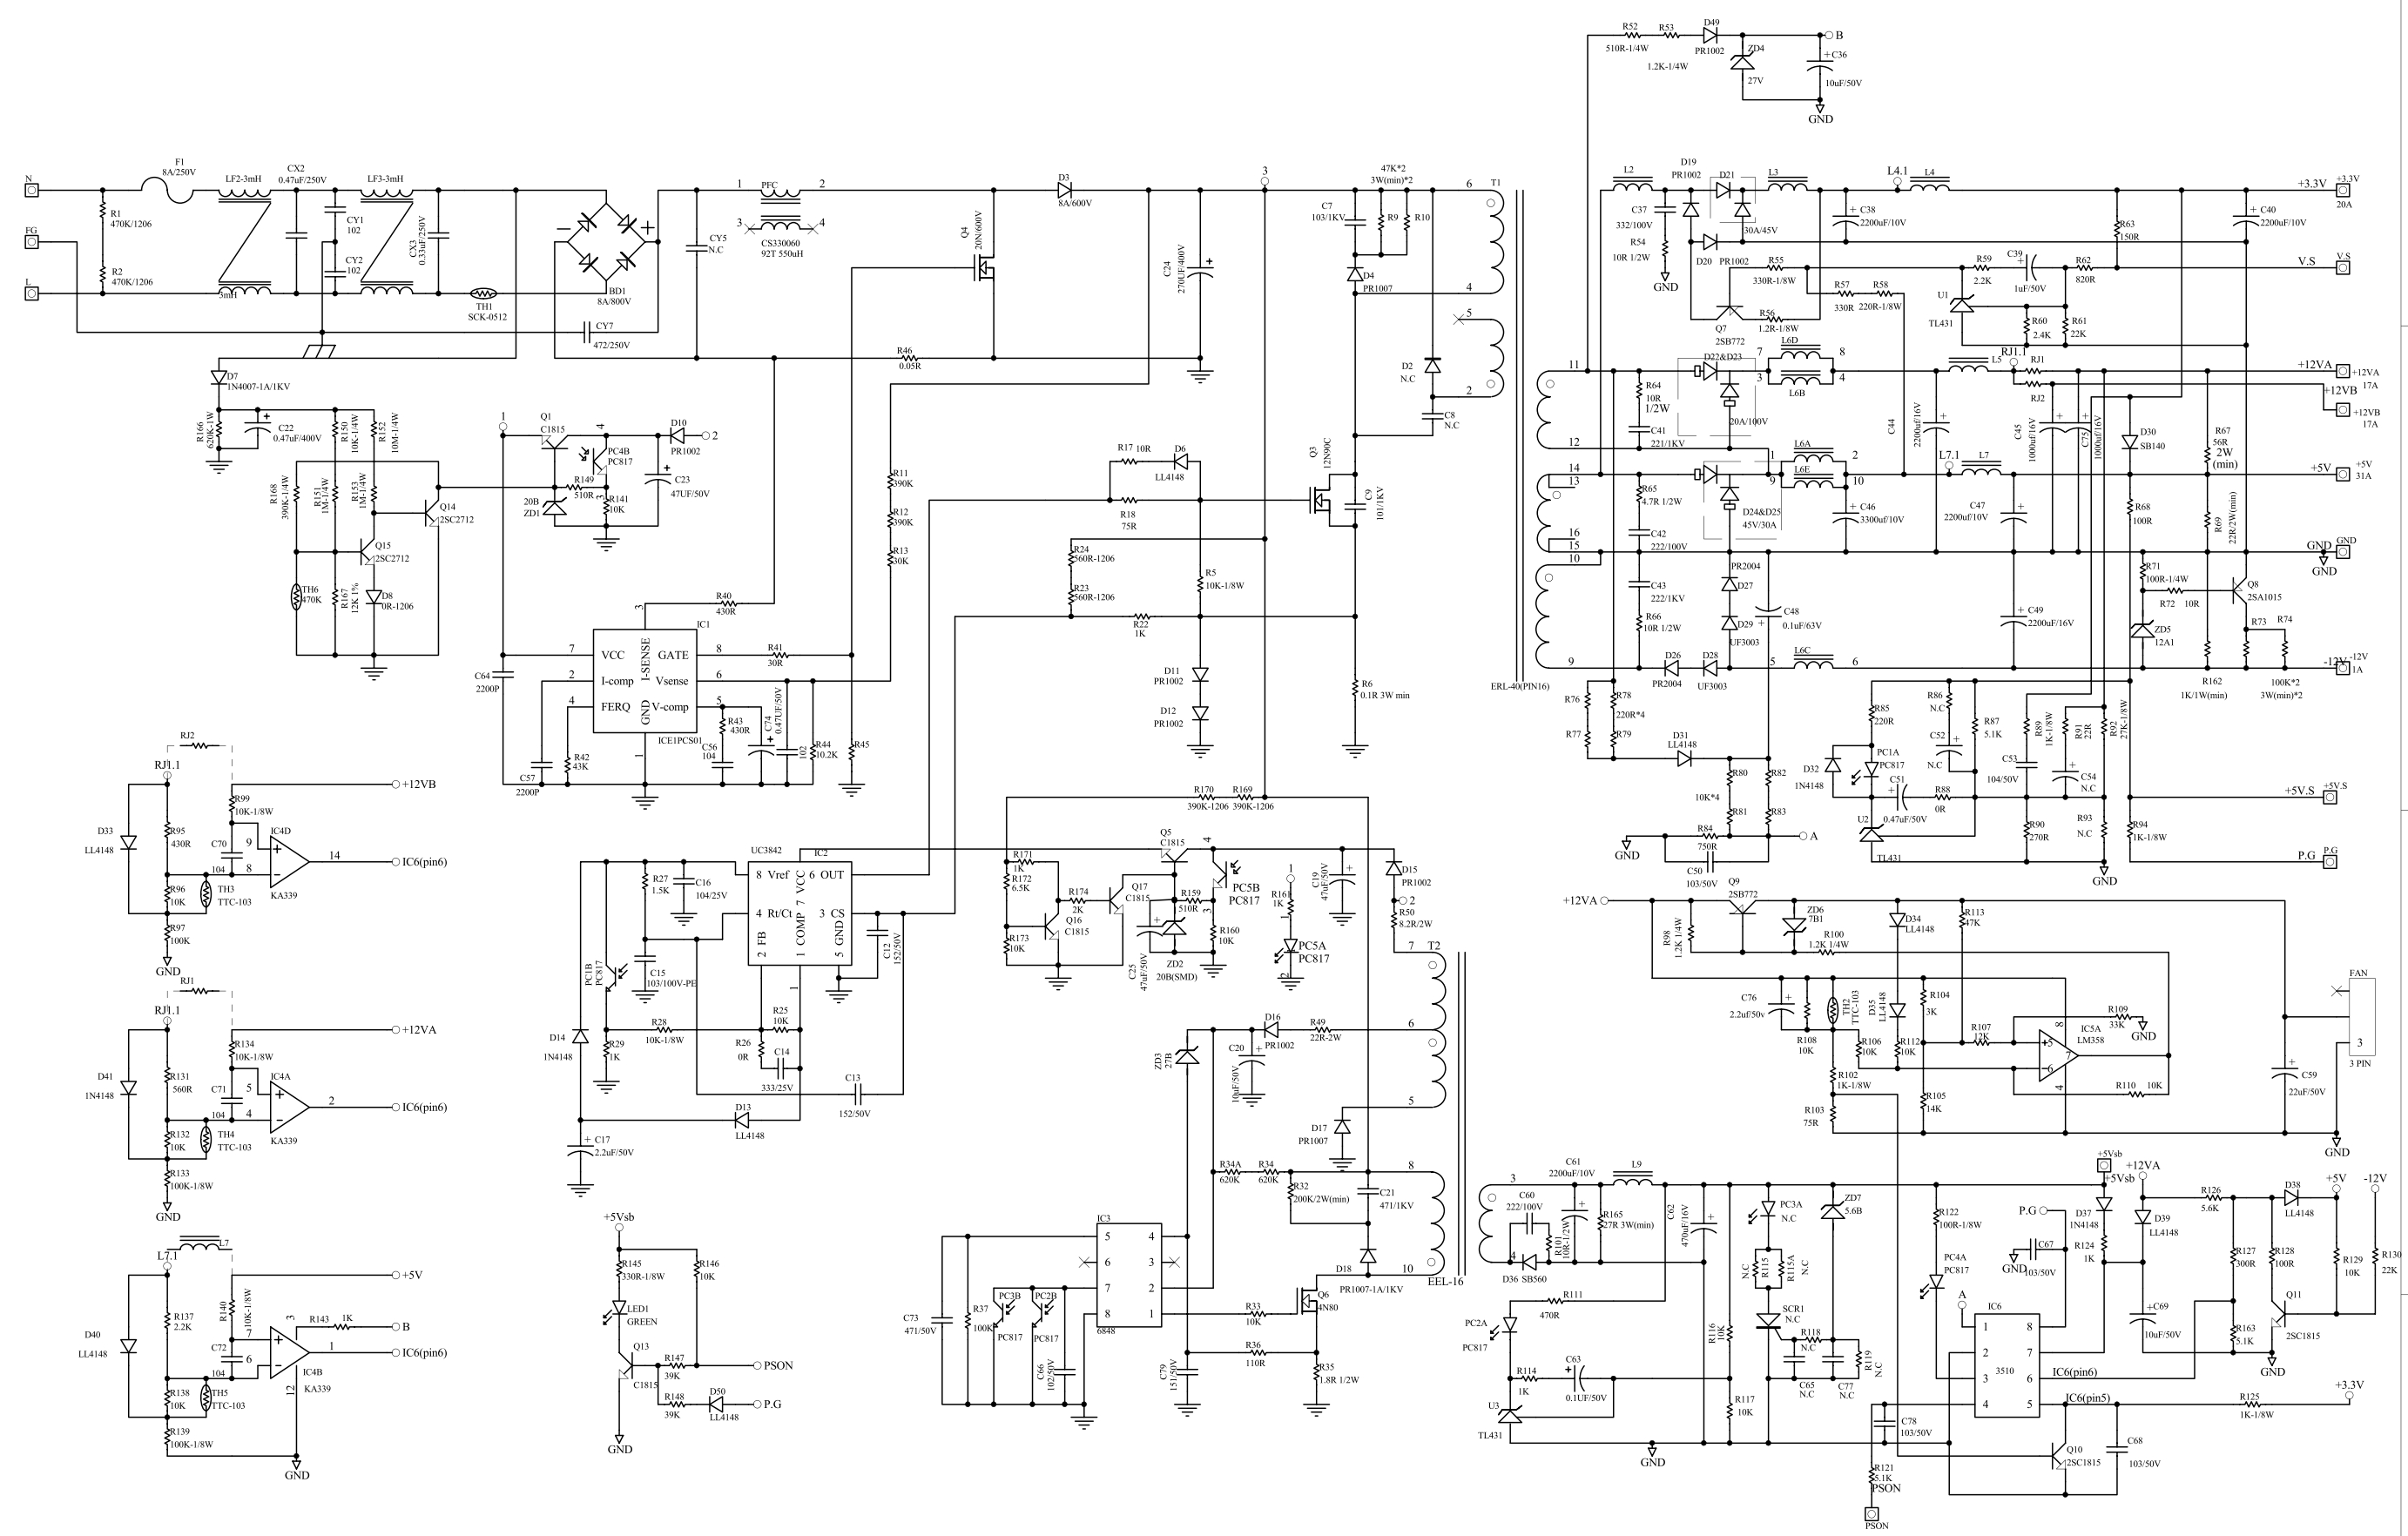 Velton atx-400 схема pdf